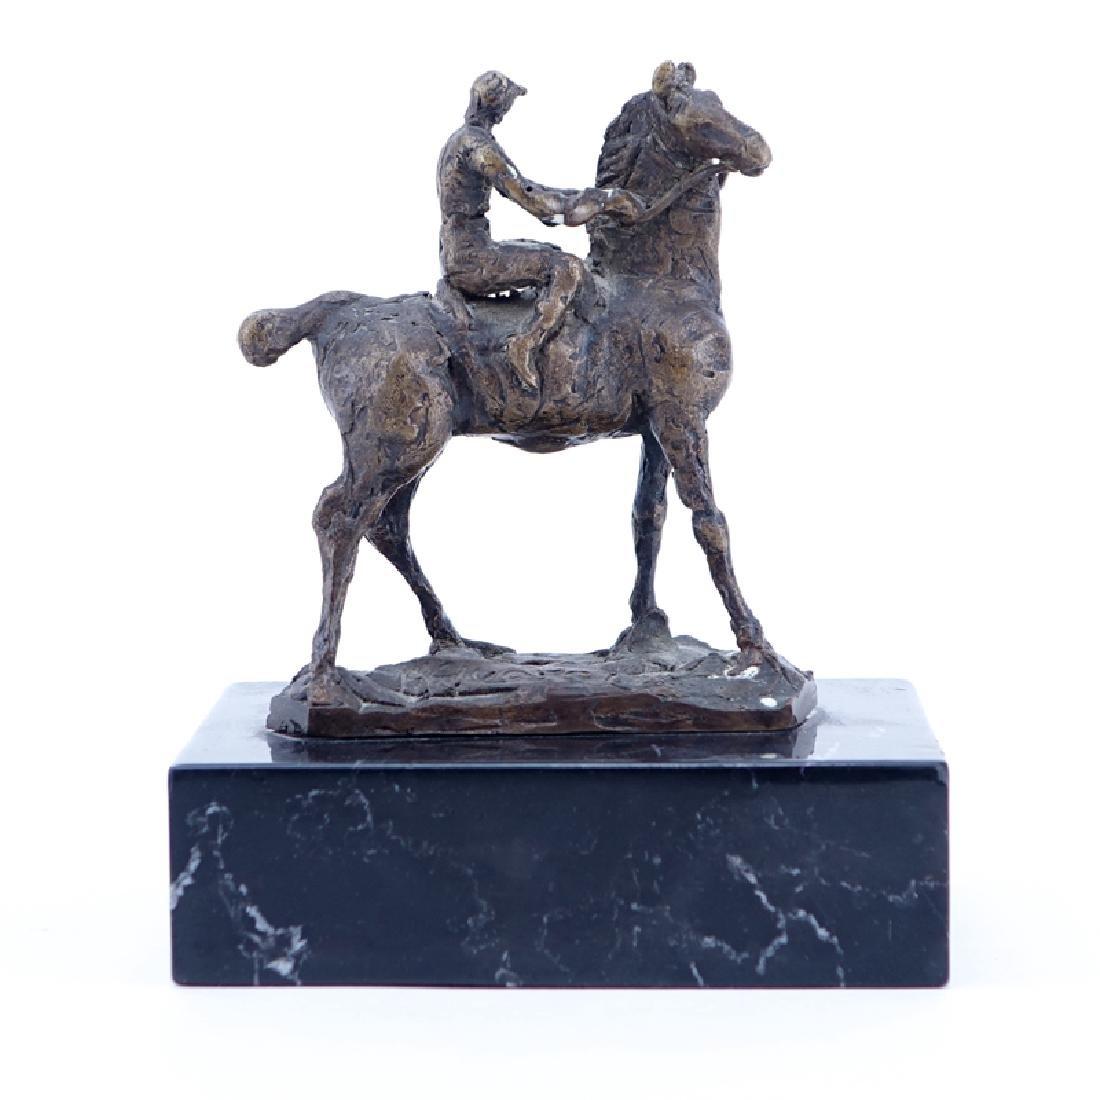 Heriberto Juarez, Mexican (1932 - 2008) Bronze